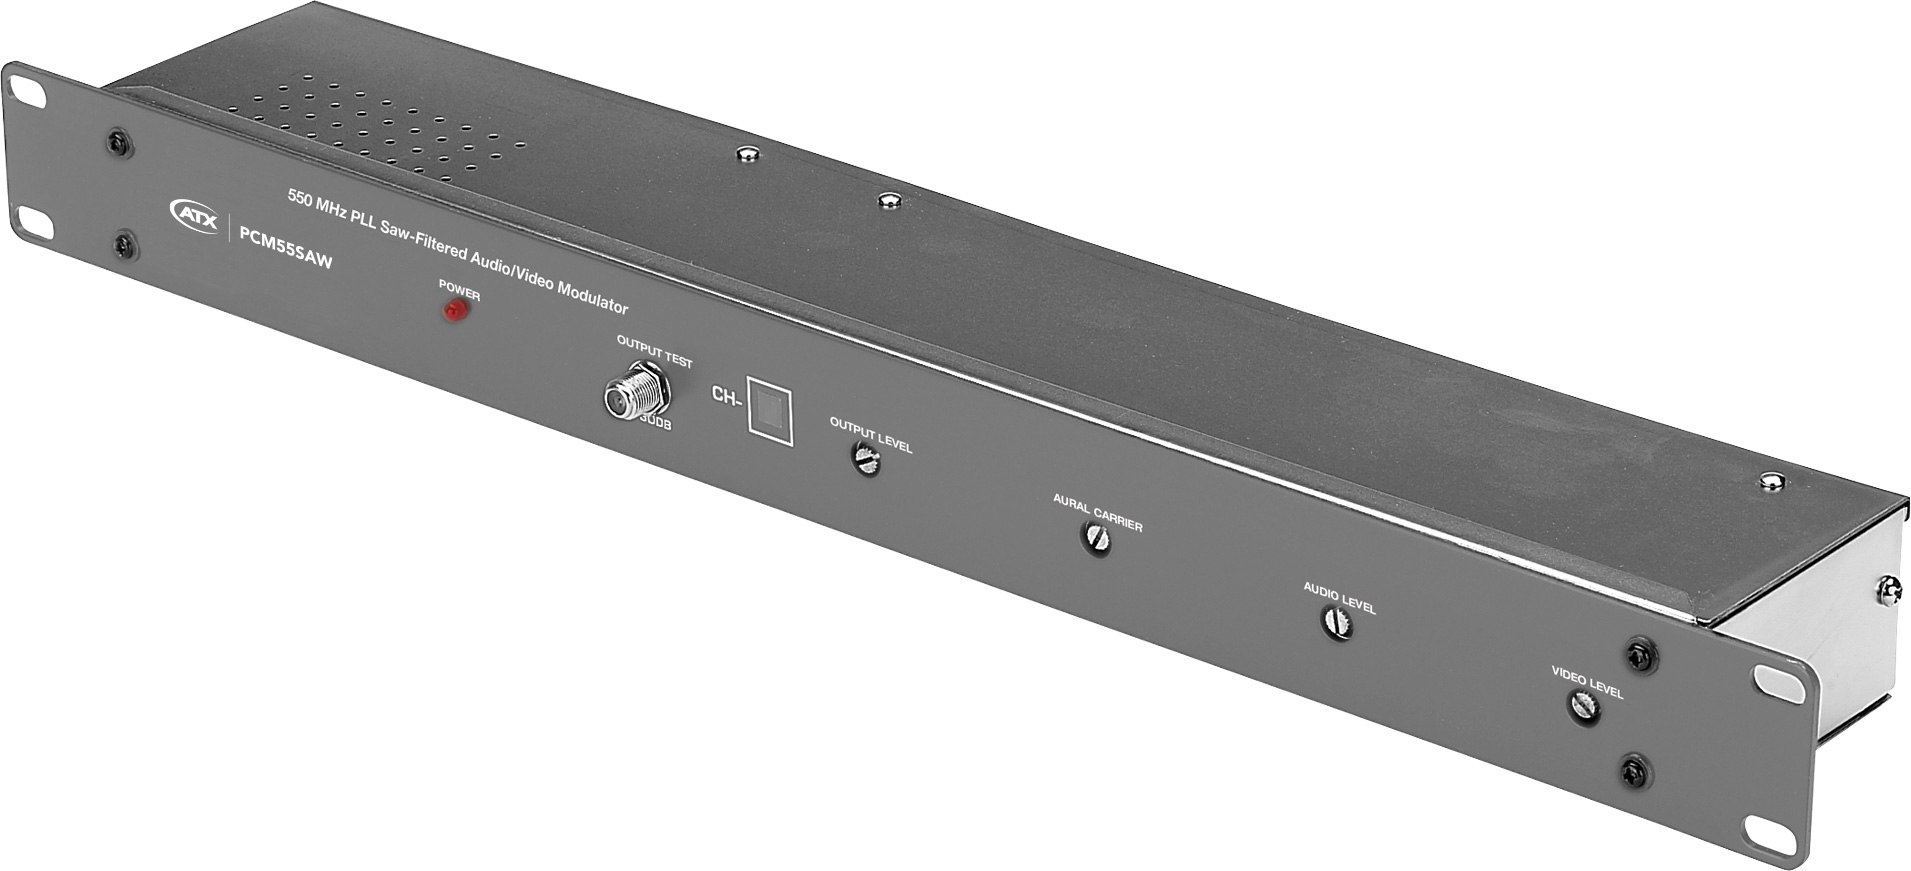 1 Channel Crystal A/V Modulator - Channel 15 PM-PCM55SAW-15